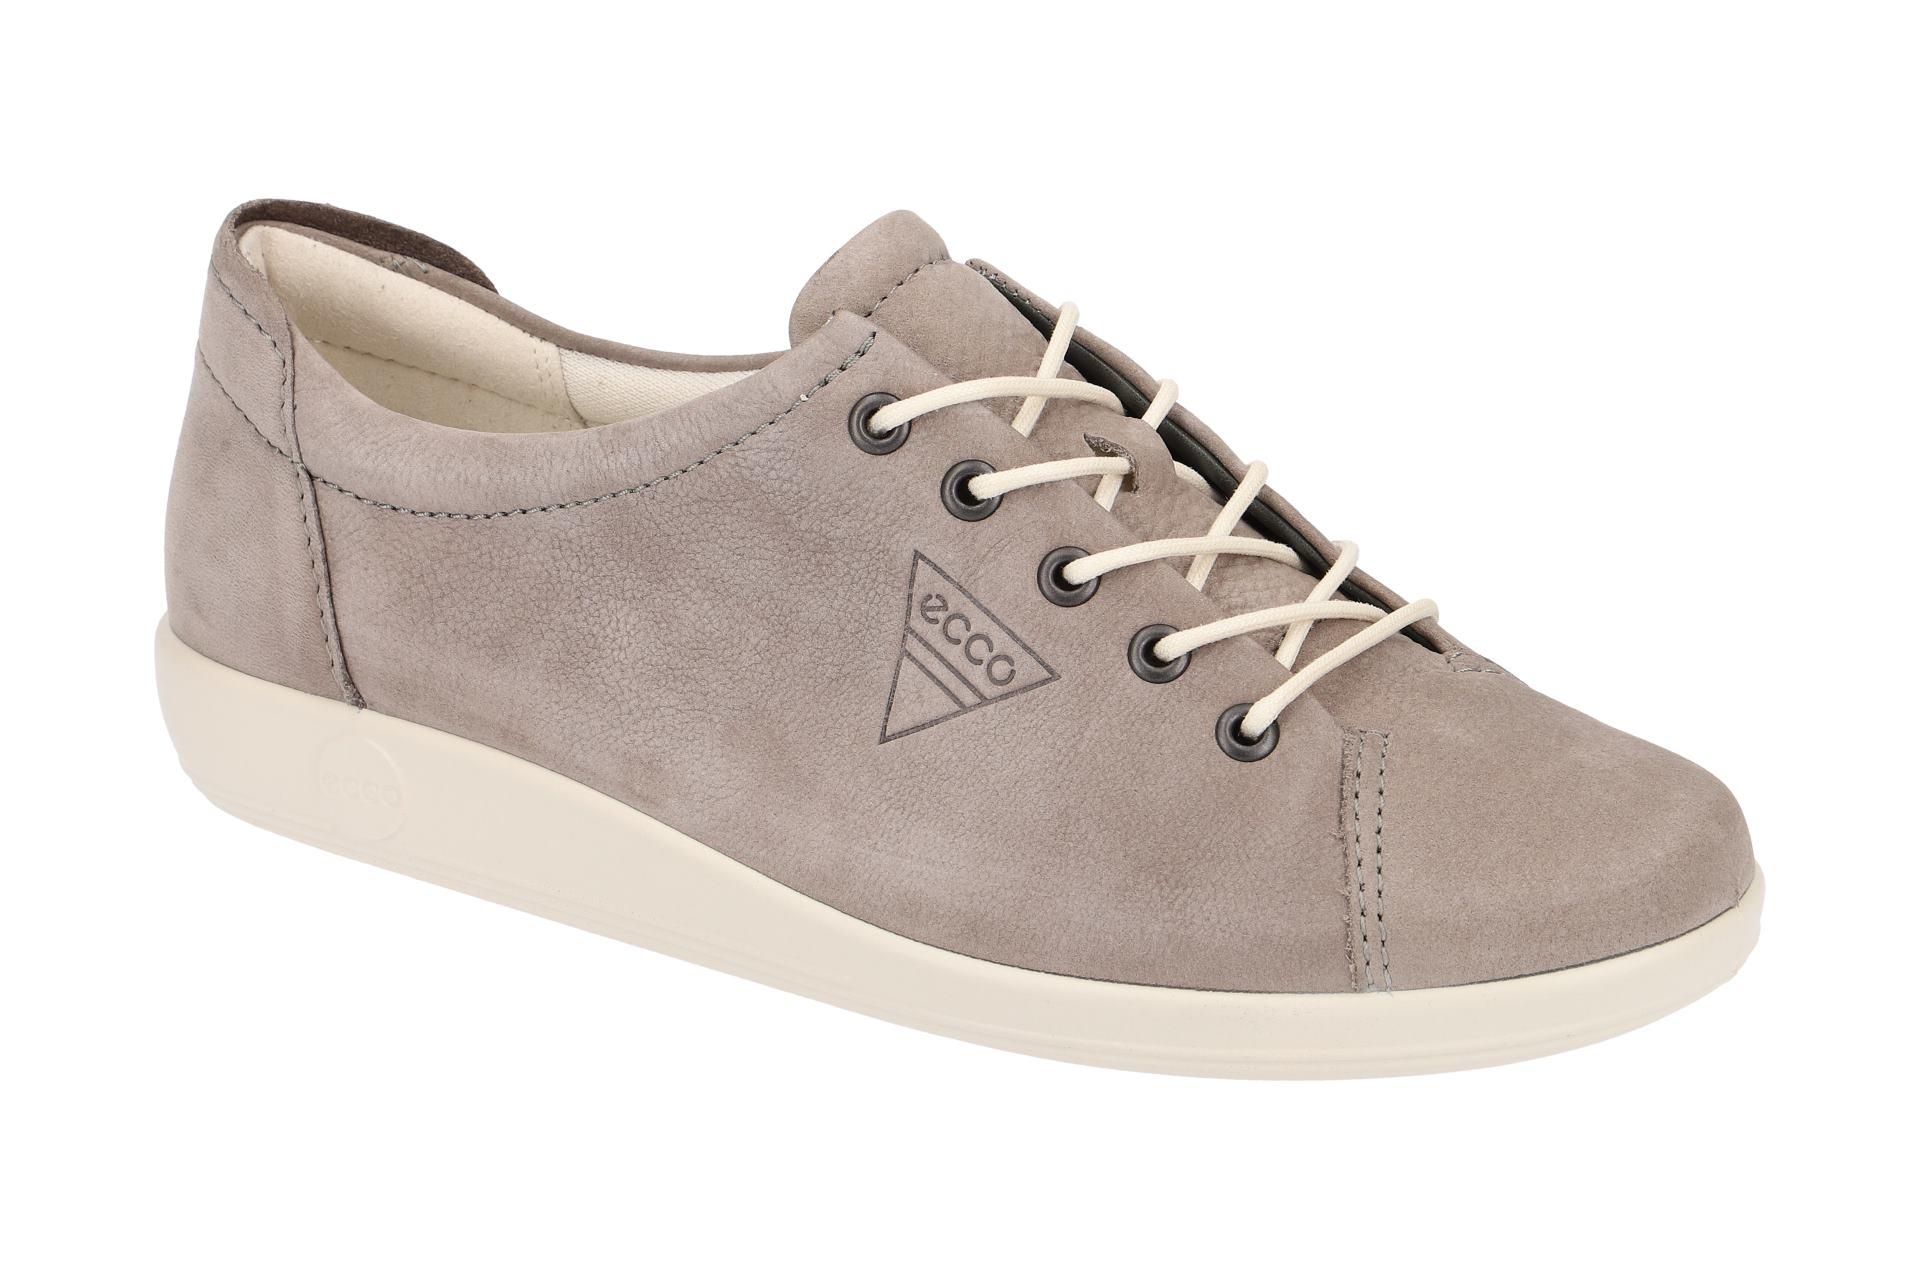 04754e3825829e Ecco Soft 2 Schuhe grau weiß NEU - Schuhhaus Strauch Shop